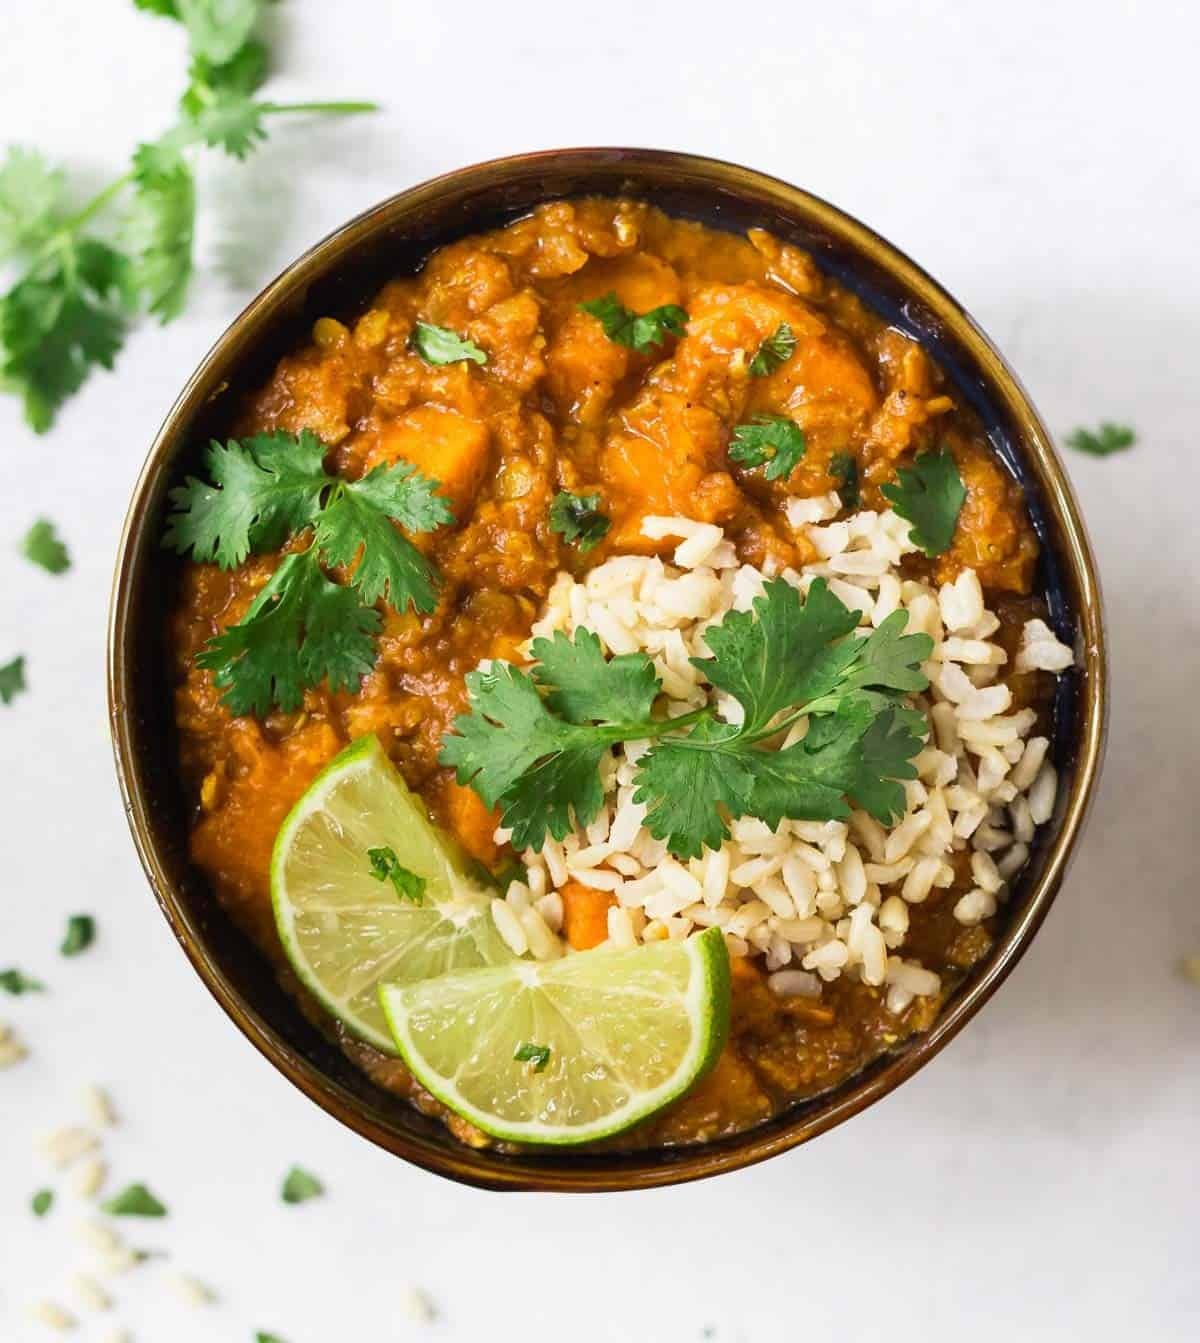 12 Vegetarian Slow Cooker Dinner Recipes